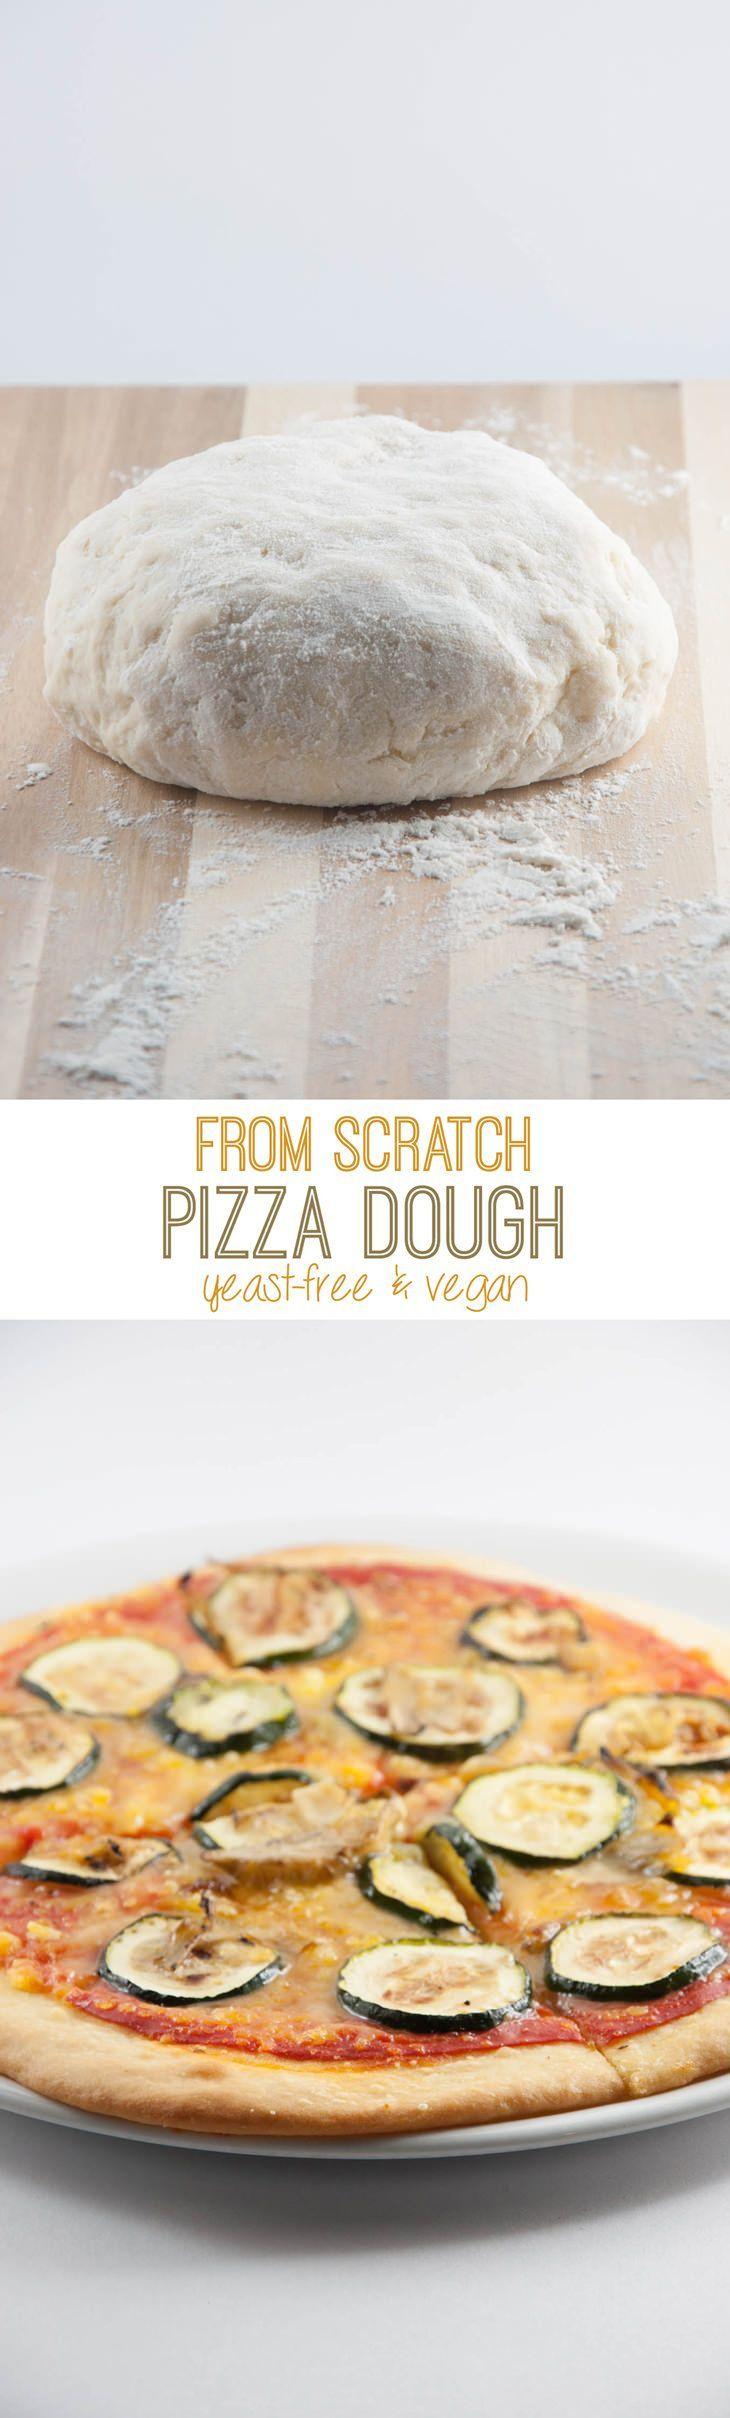 Yeast-Free Vegan Pizza Dough | http://ElephantasticVegan.com | Vegan ...